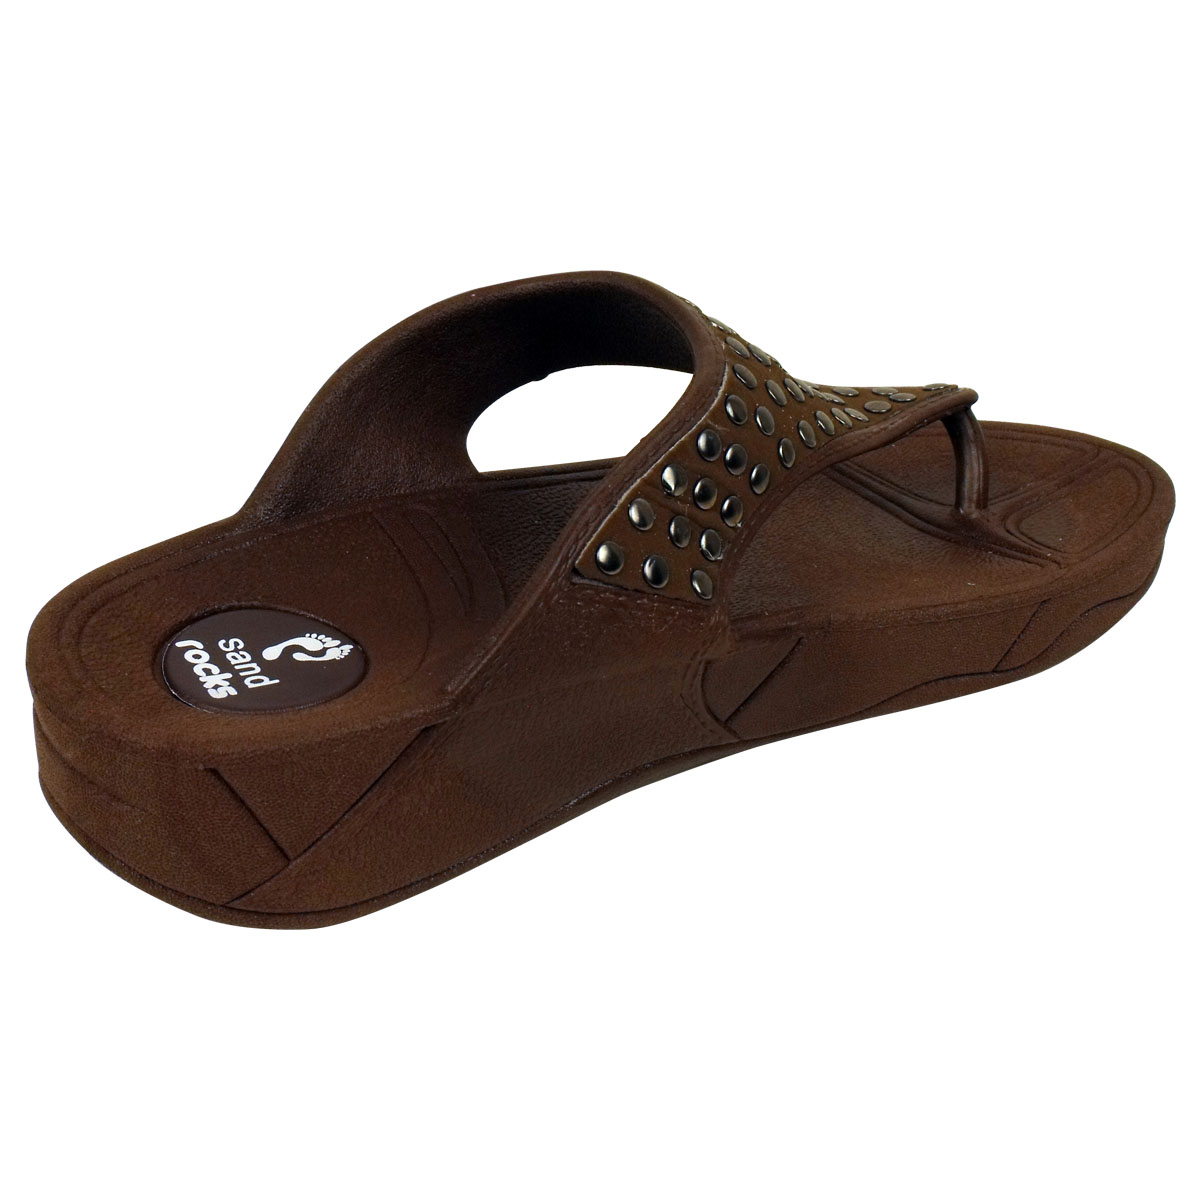 Women Toe Post Keep Fit Workout Sandal Flip Flop Wedge